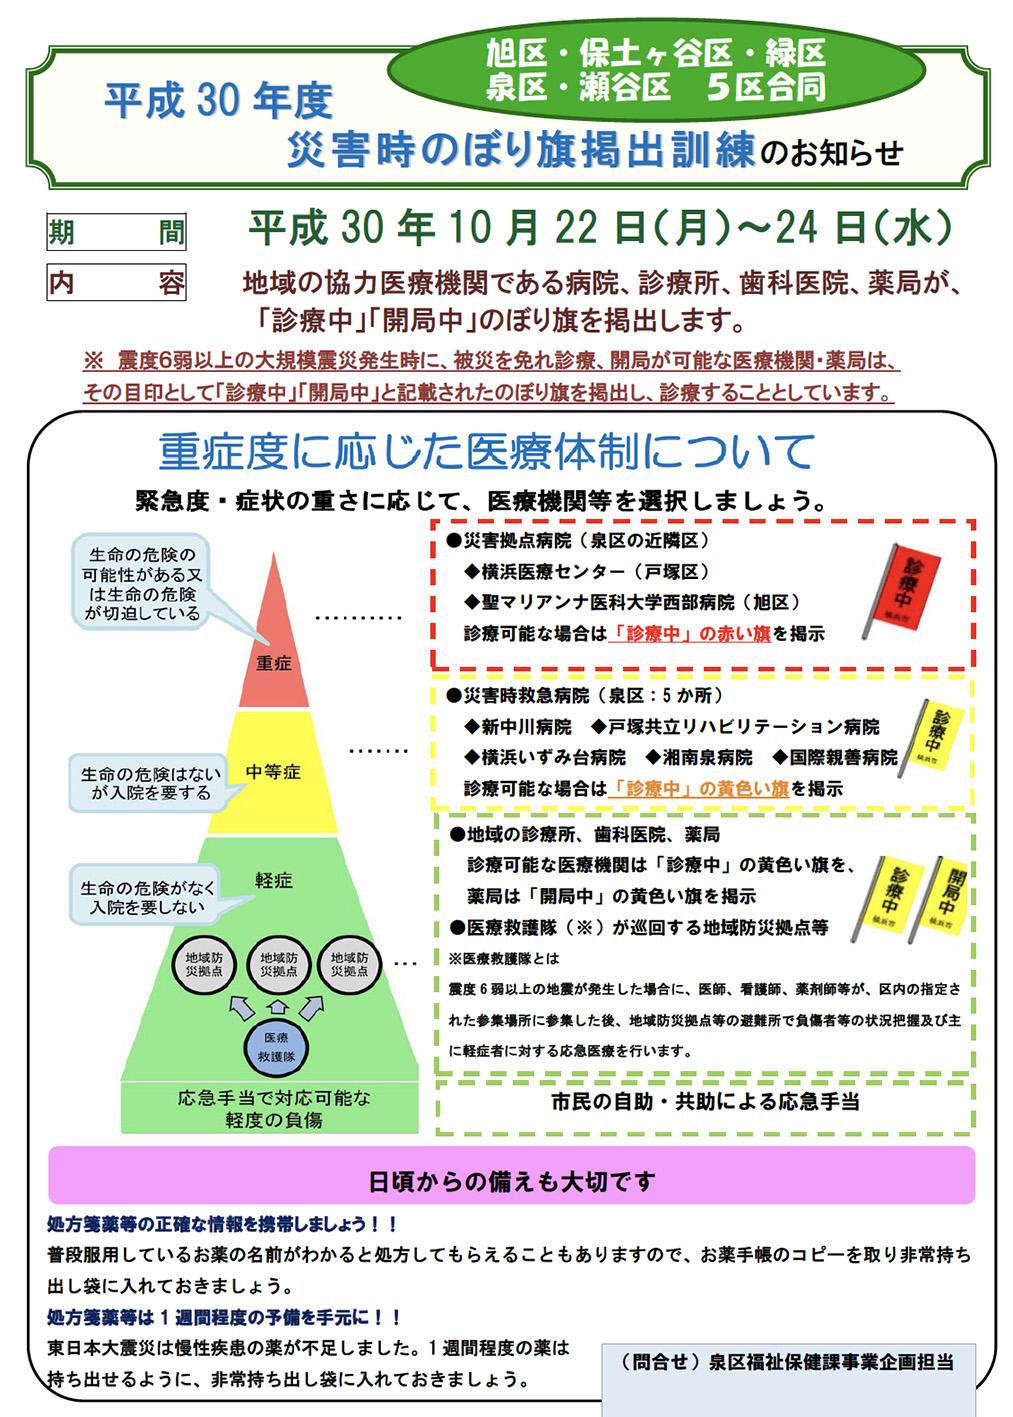 MBLOG18-10-23-2